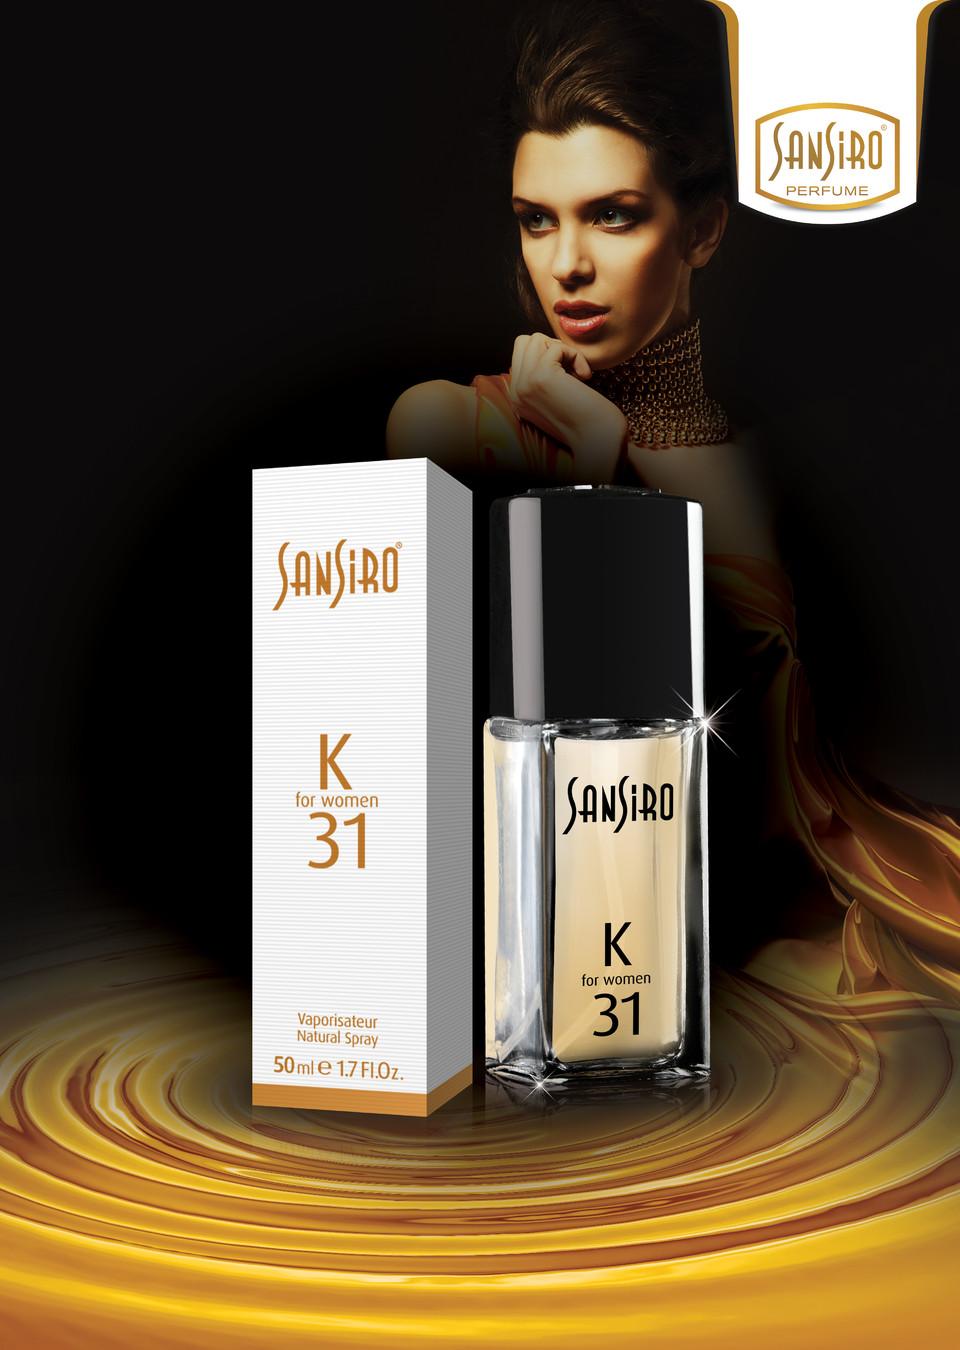 Sansiro Perfume - For Women - Jasmin (K31)